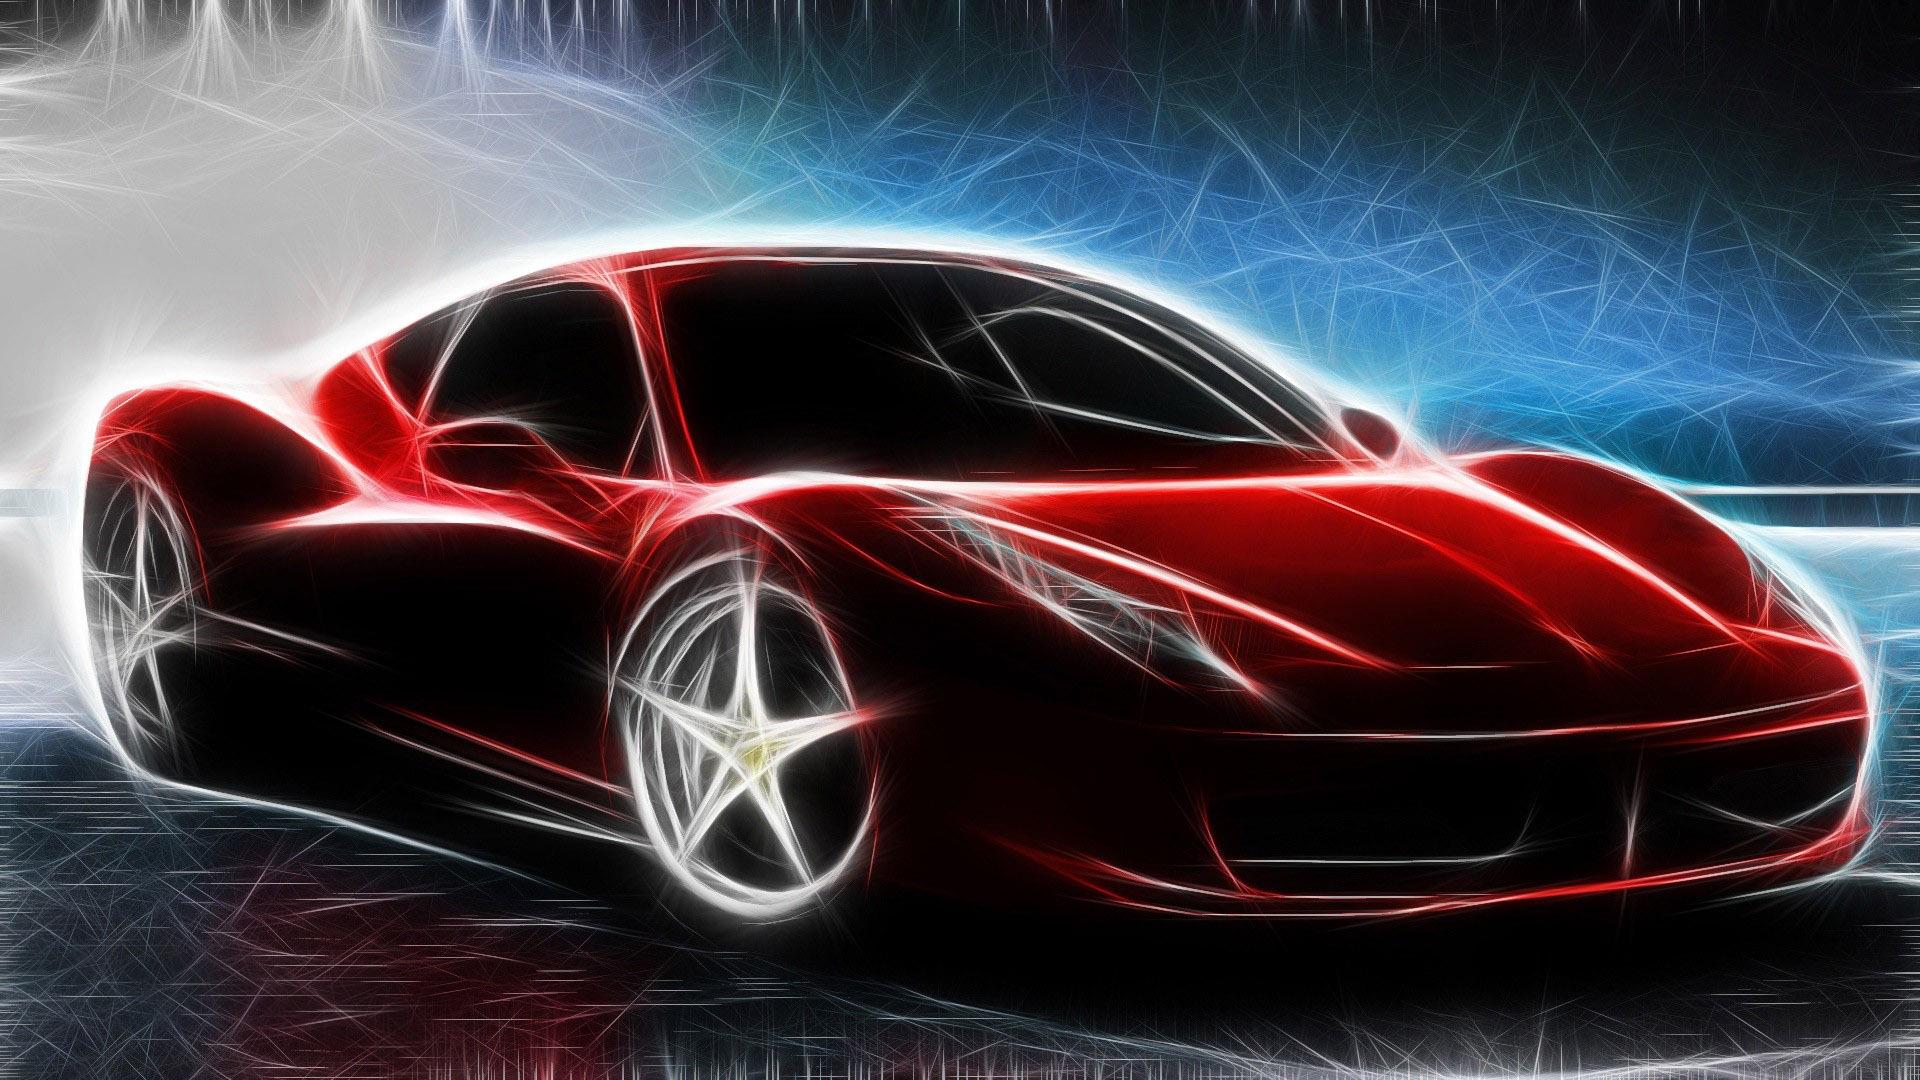 Ferrari 458 Italia wallpaper 10265 1920x1080